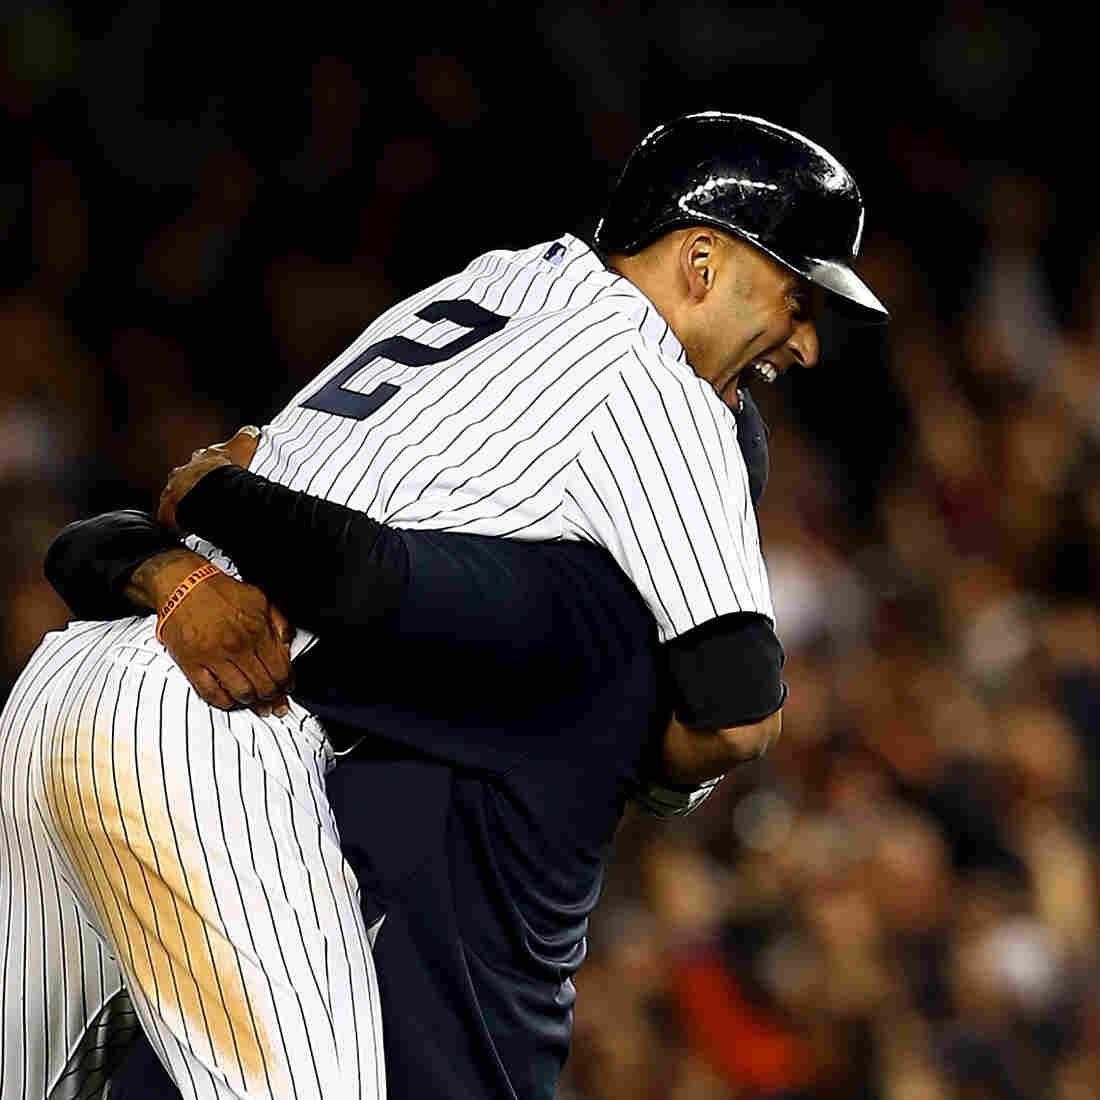 Photos: Jeter Leaves Yankee Stadium With One Last Game-Winning Hit